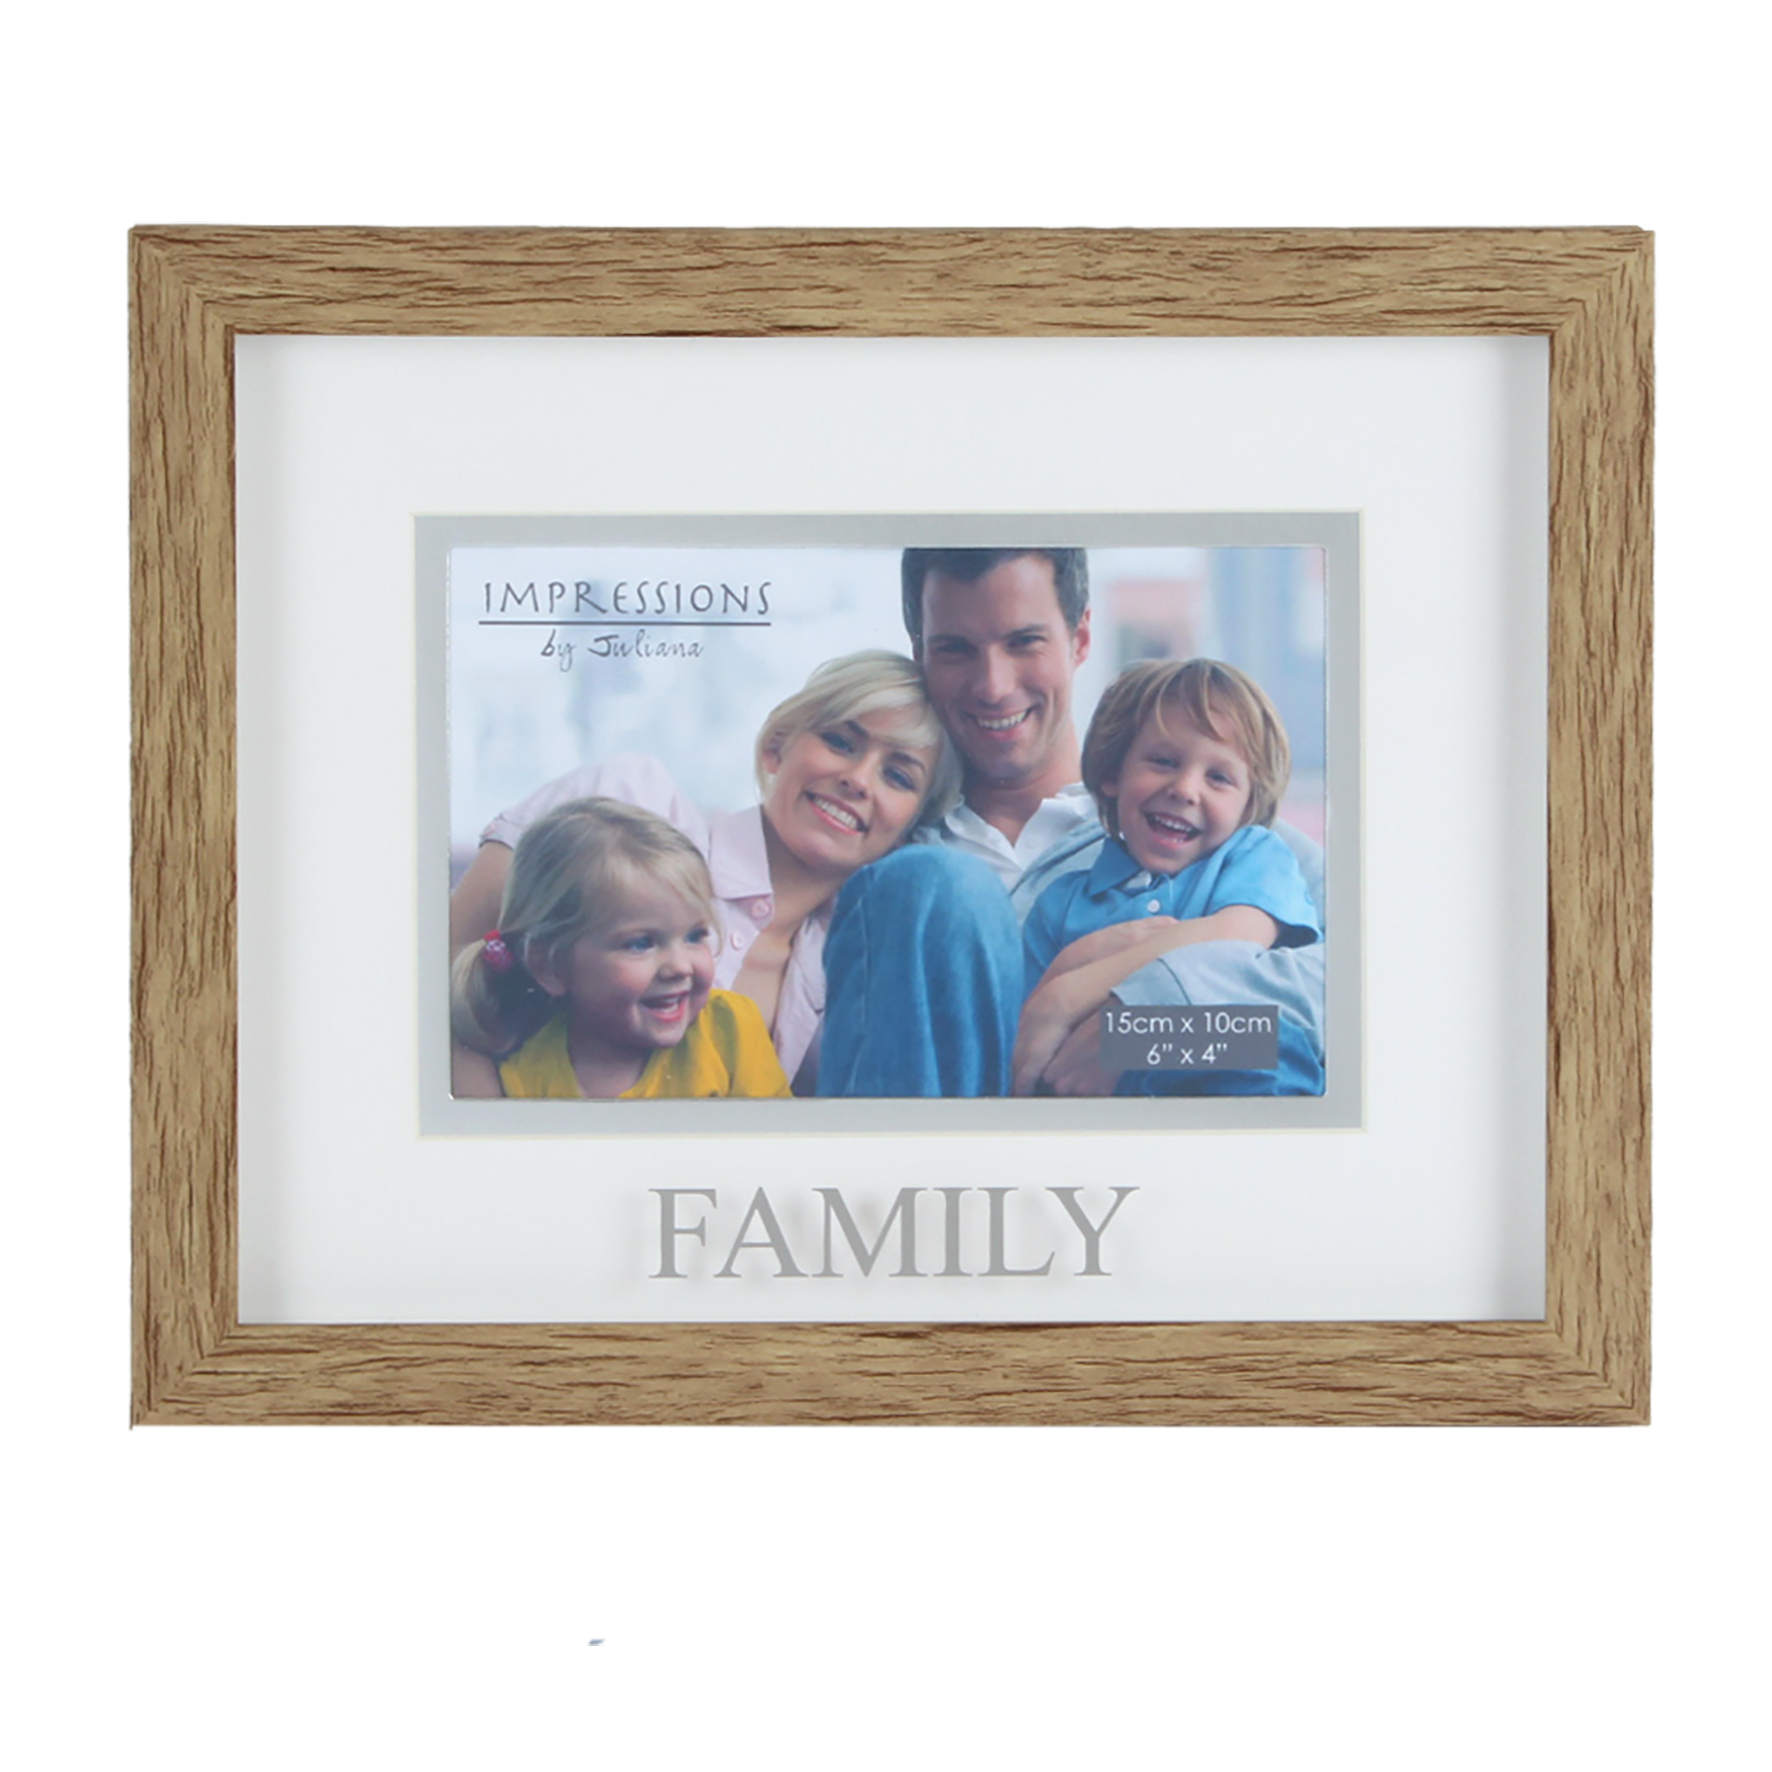 Juliana Family Natural Wood Effect Photo Frame | Gifts | Love Kates